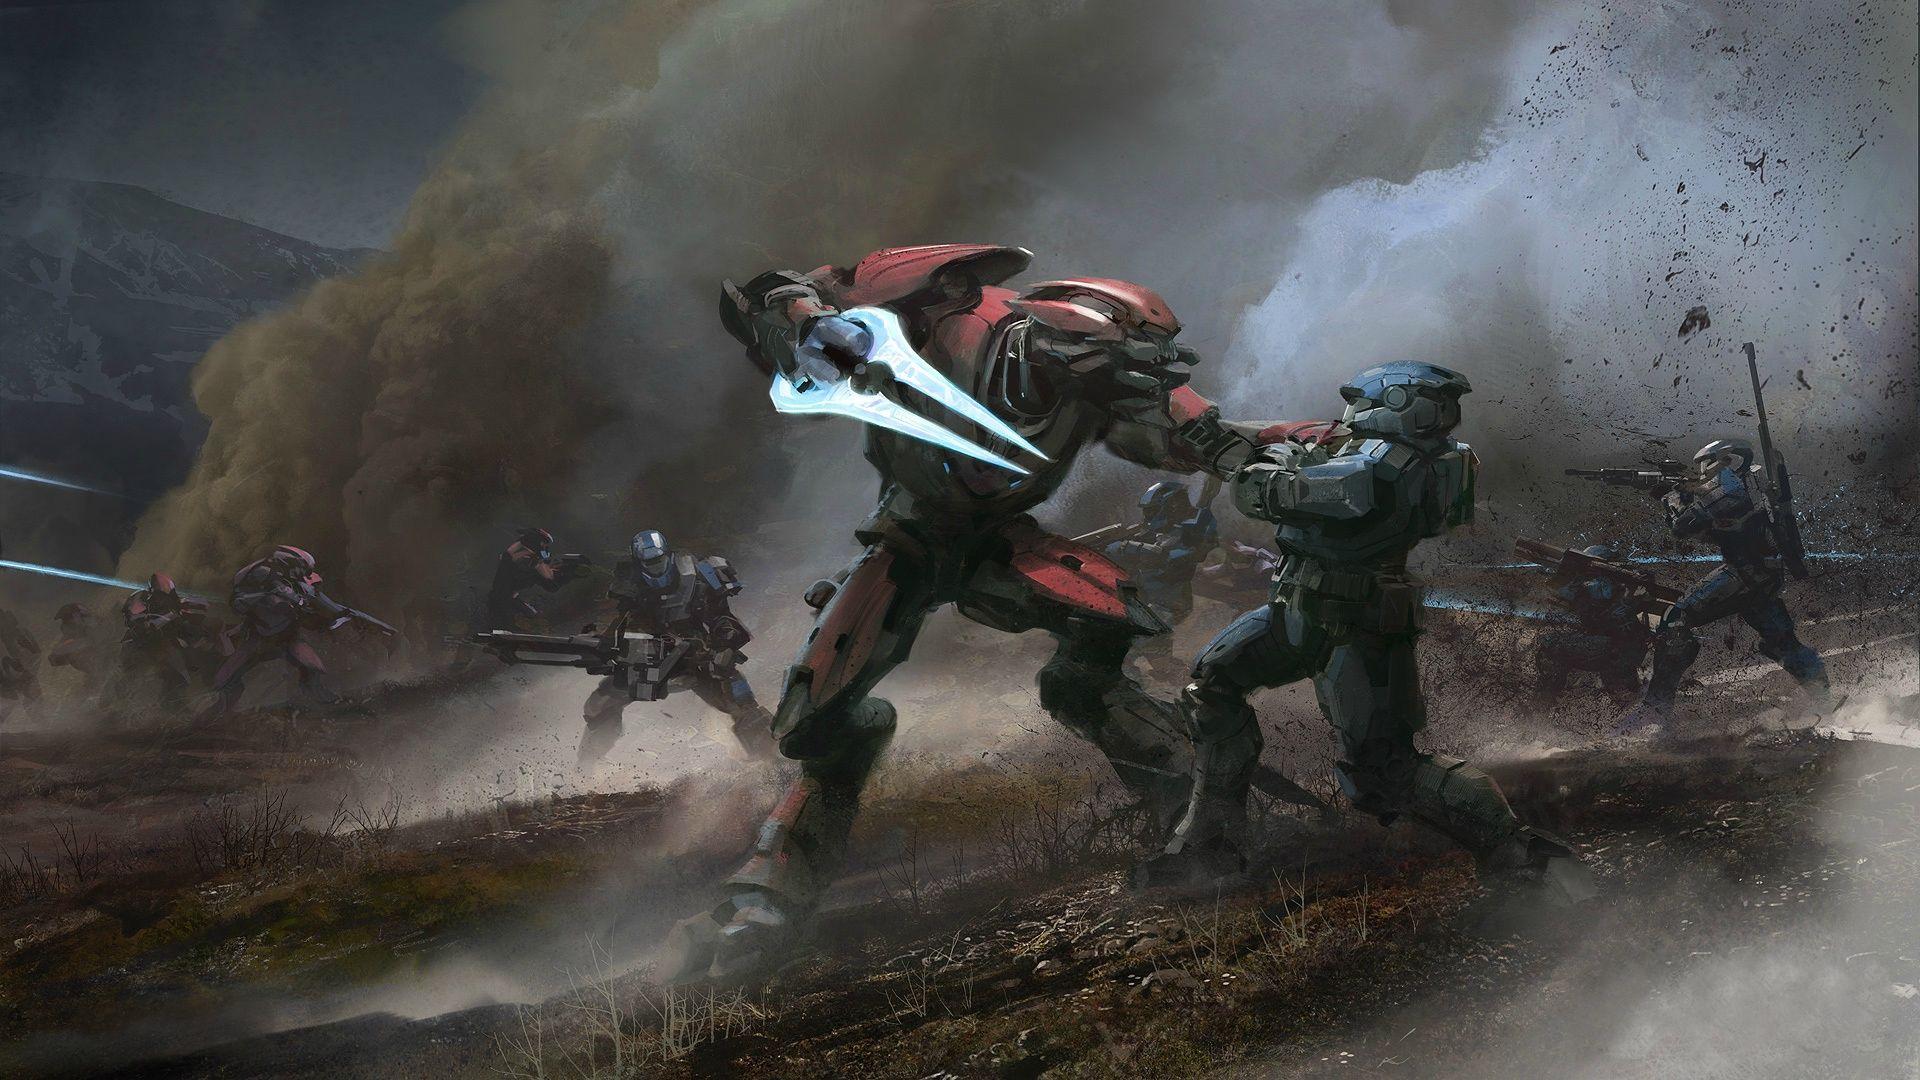 Halo wallpaper 1080p Group (85+)